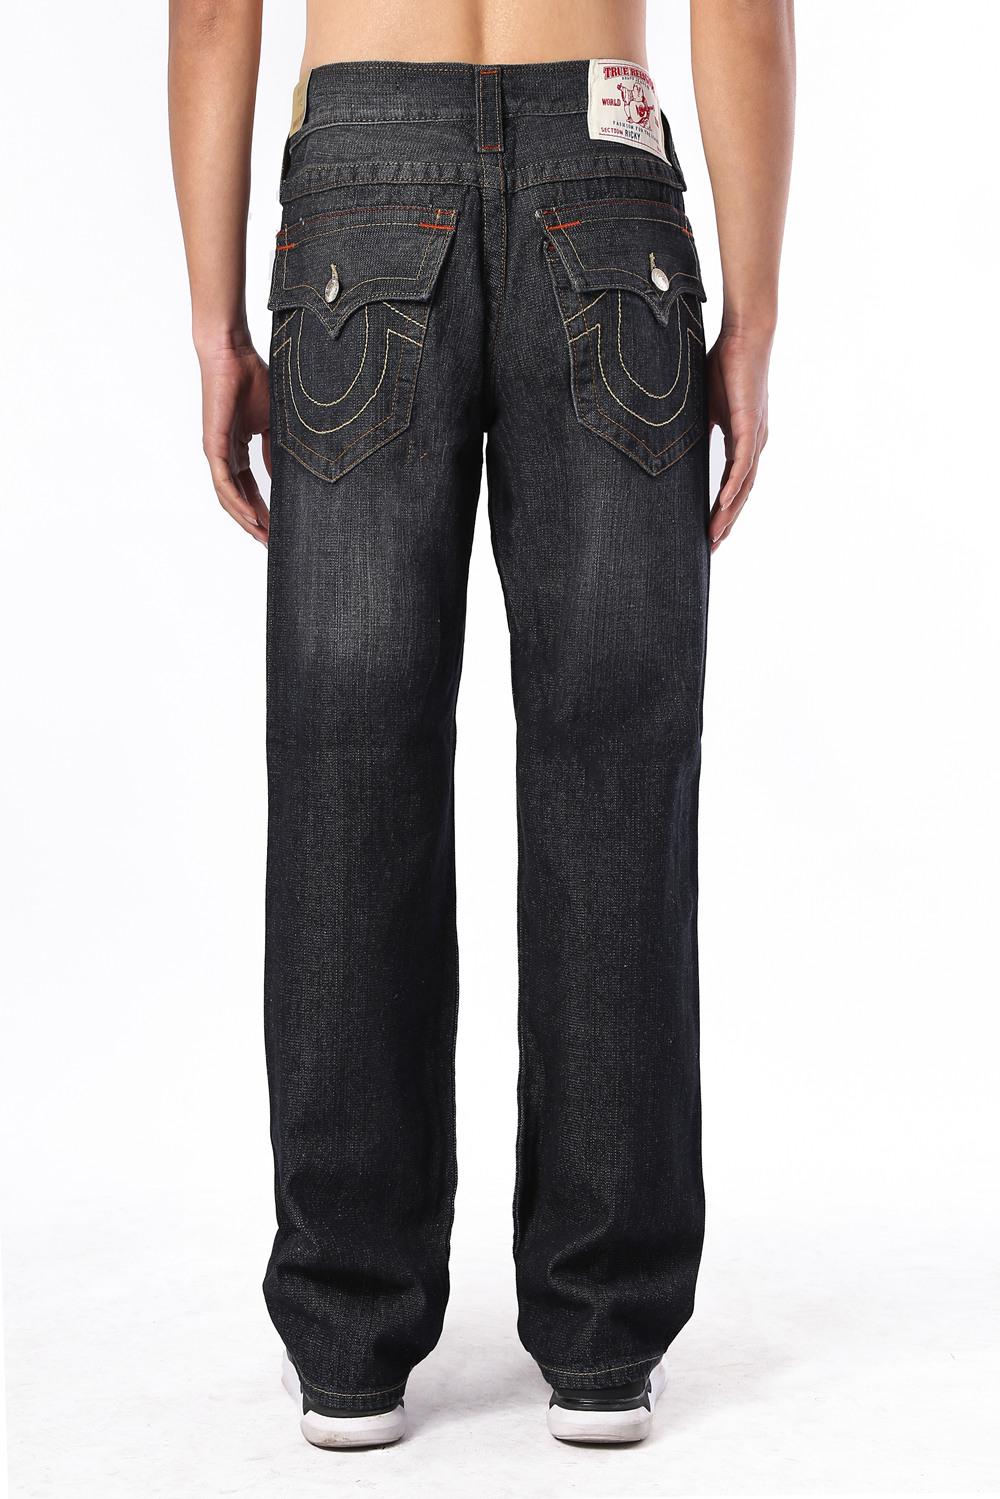 True Religion Mens Jeans Back